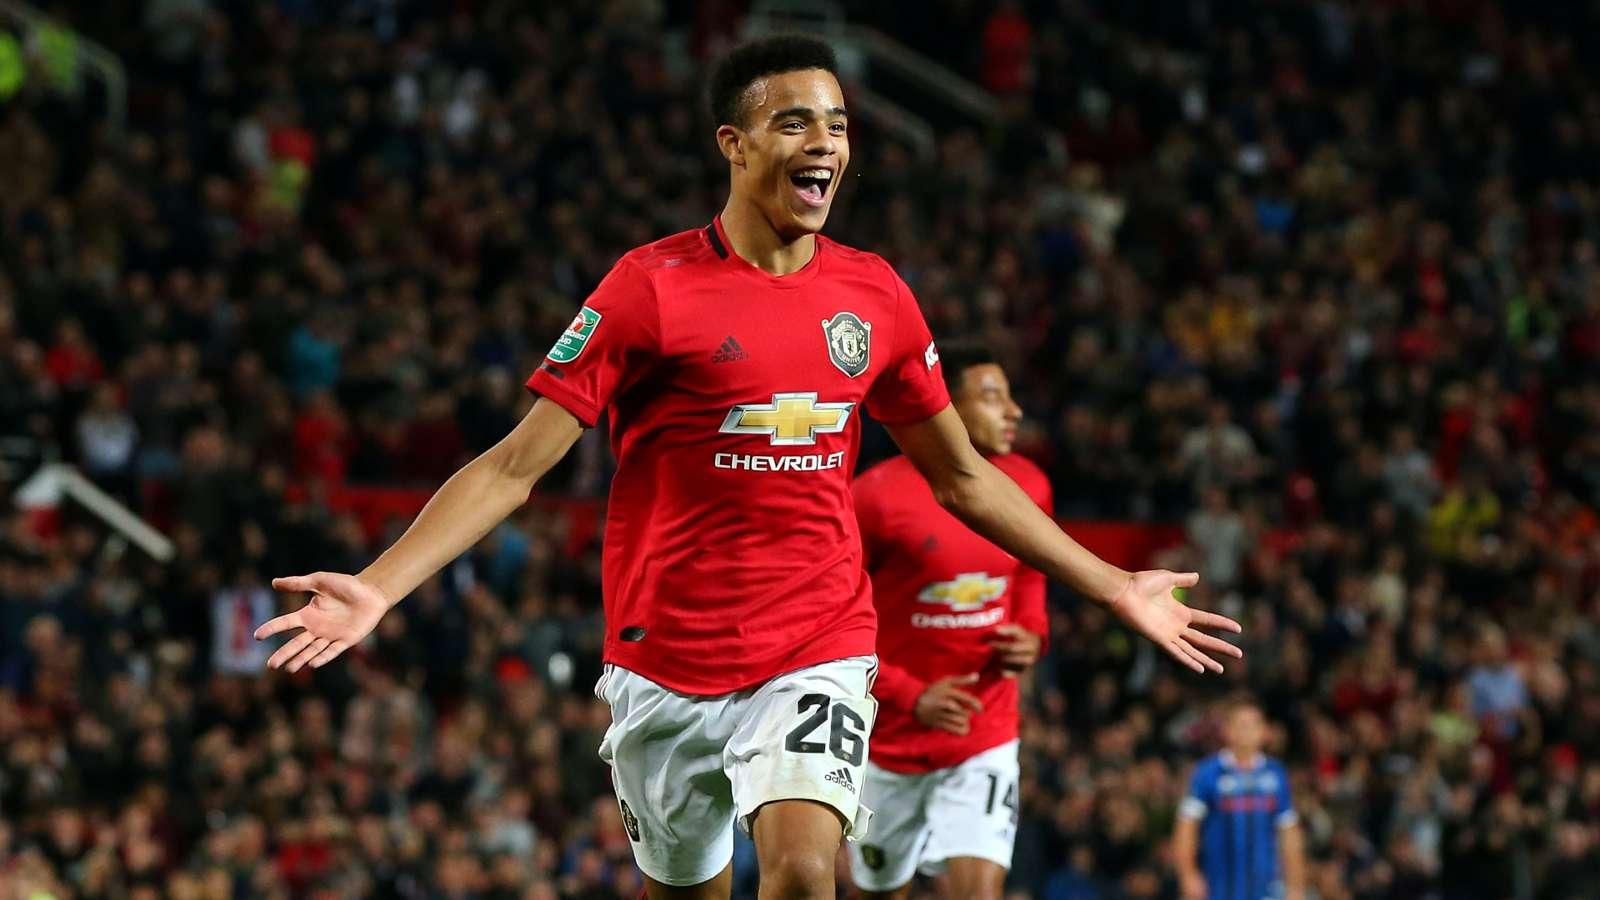 Cetak 2 Gol Untuk Manchester United Di Eropa Mason